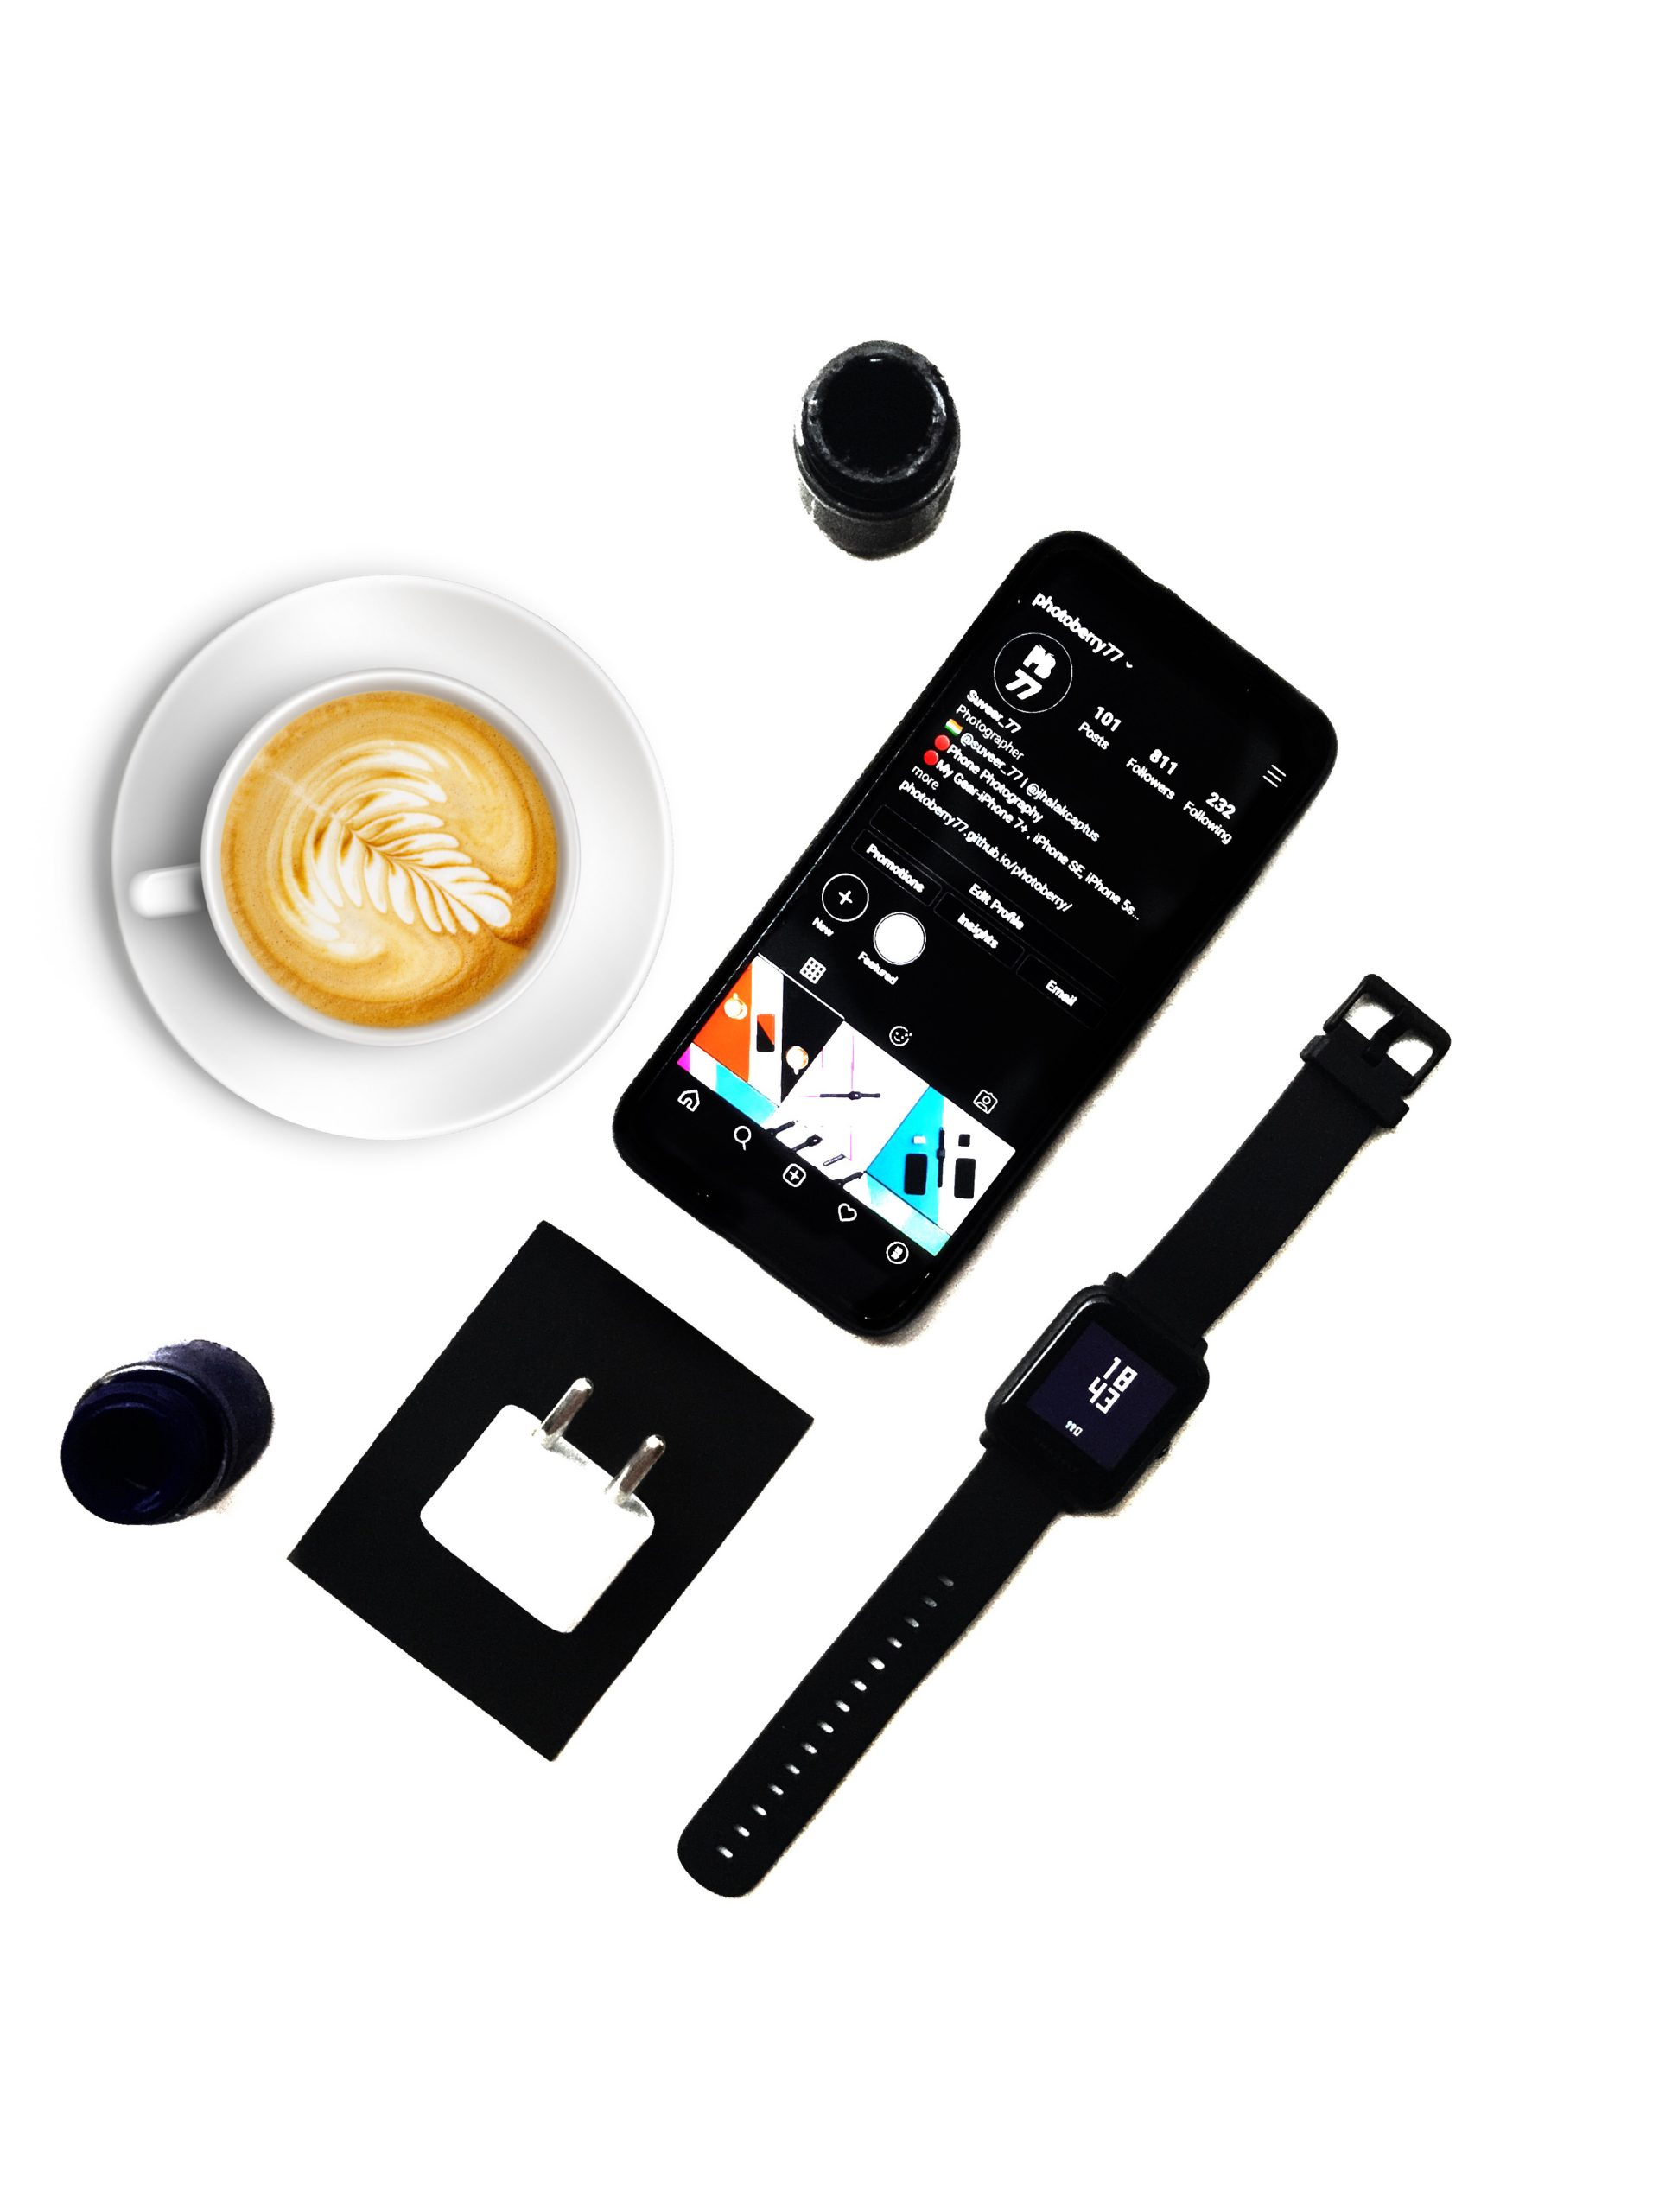 Electronics and coffee.